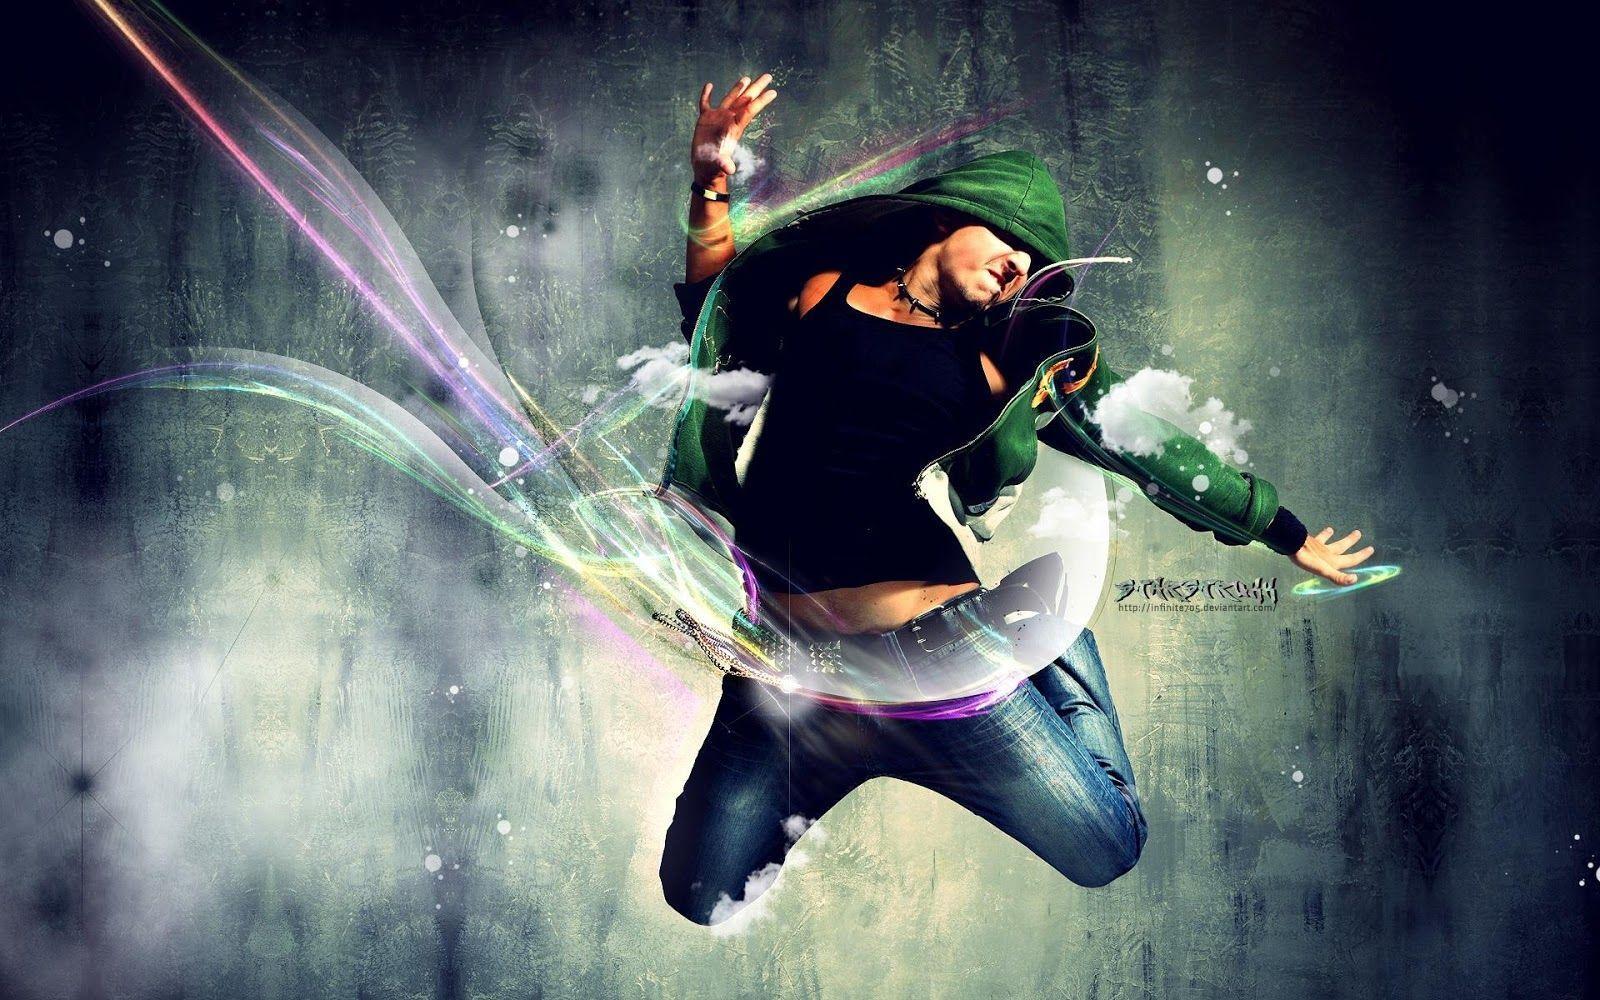 dance wallpaper cool girl - photo #22